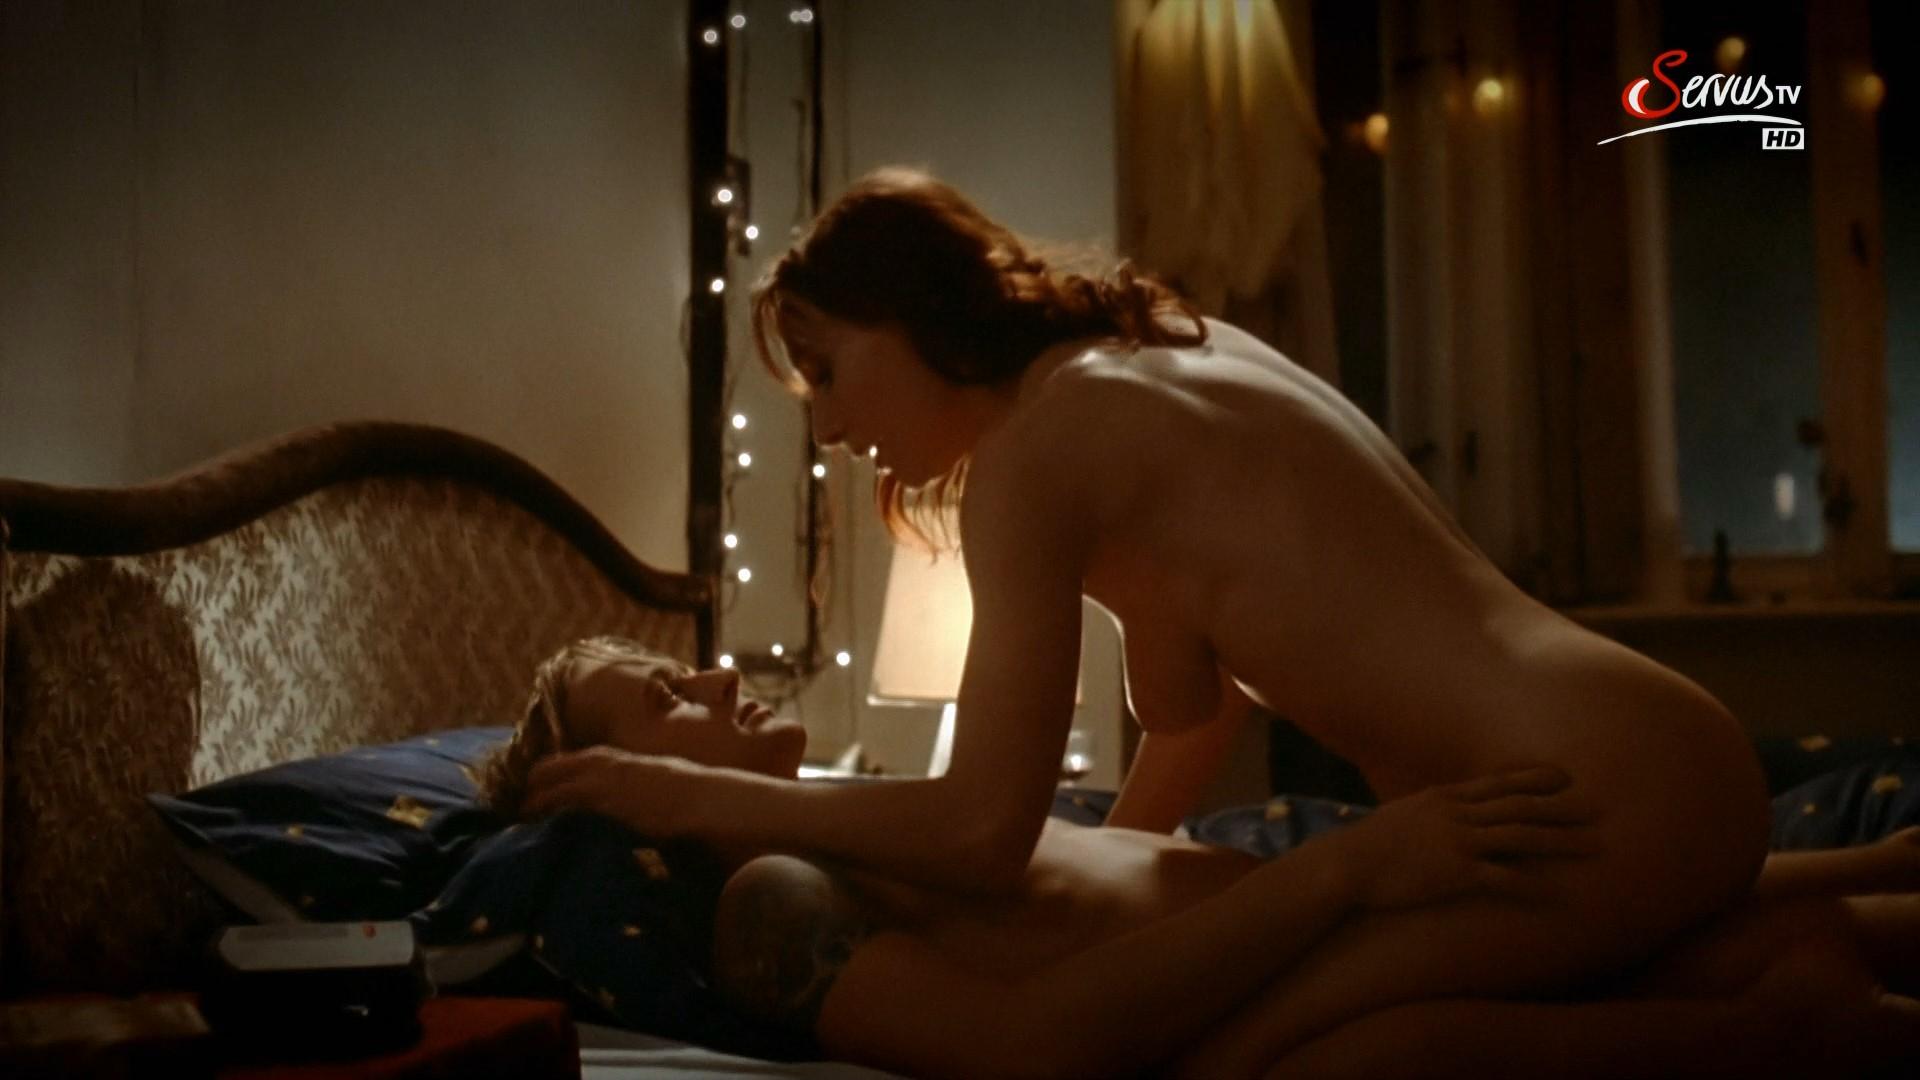 image Rita lengyel and araba walton nude berlin calling